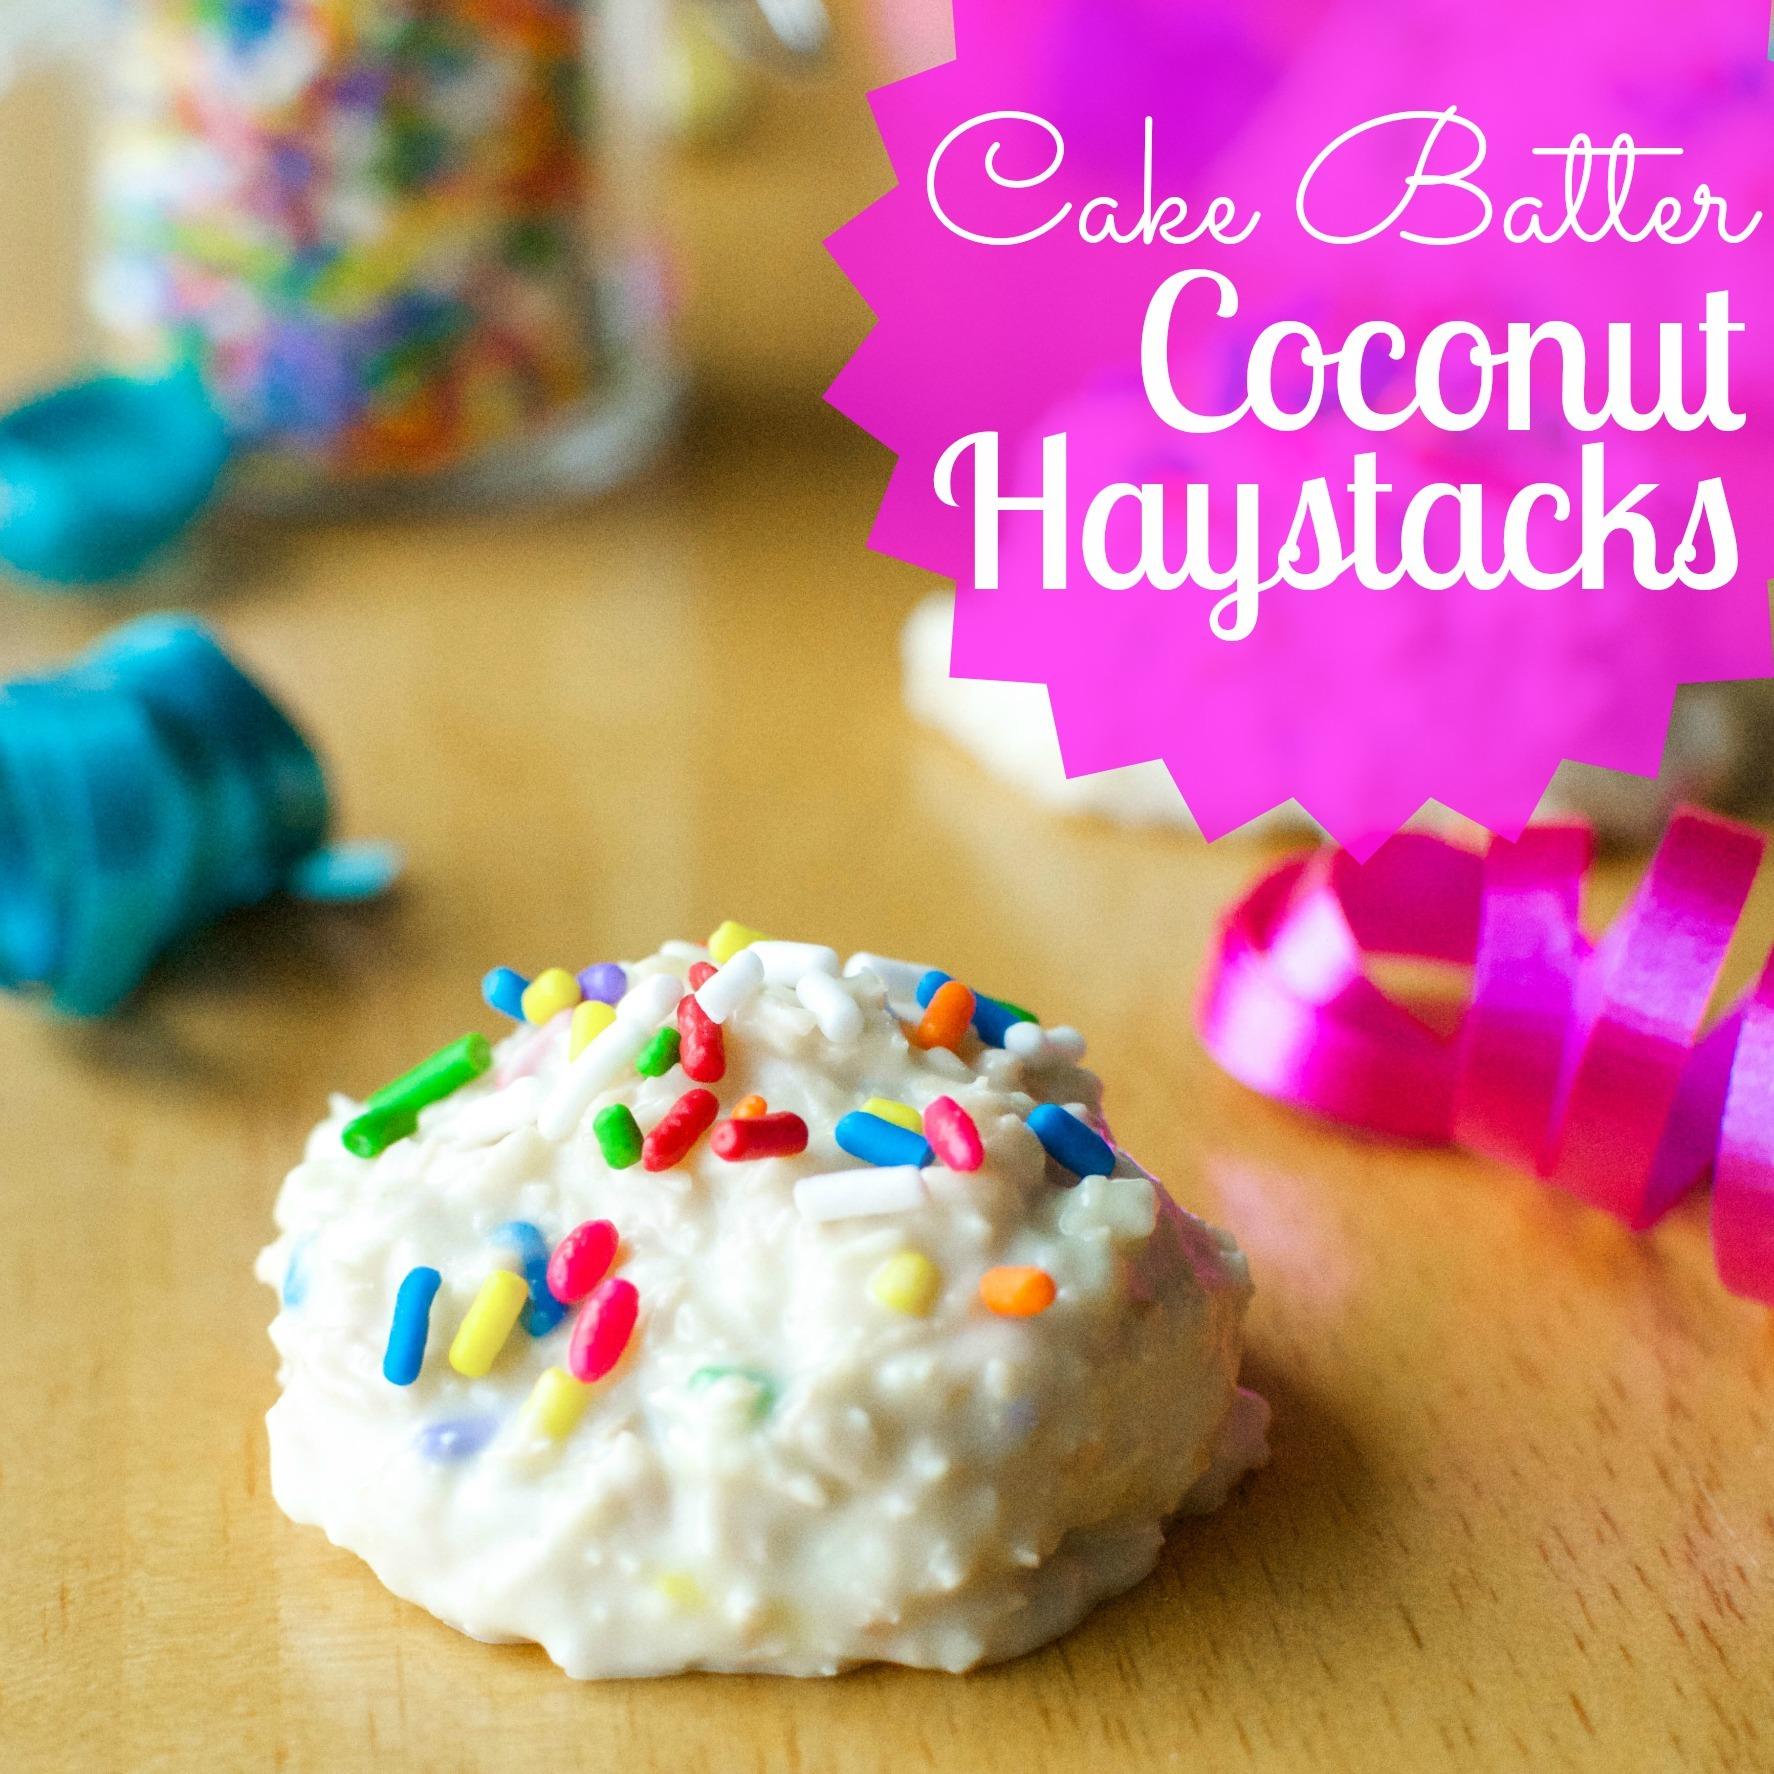 Cake Batter Coconut Haystacks